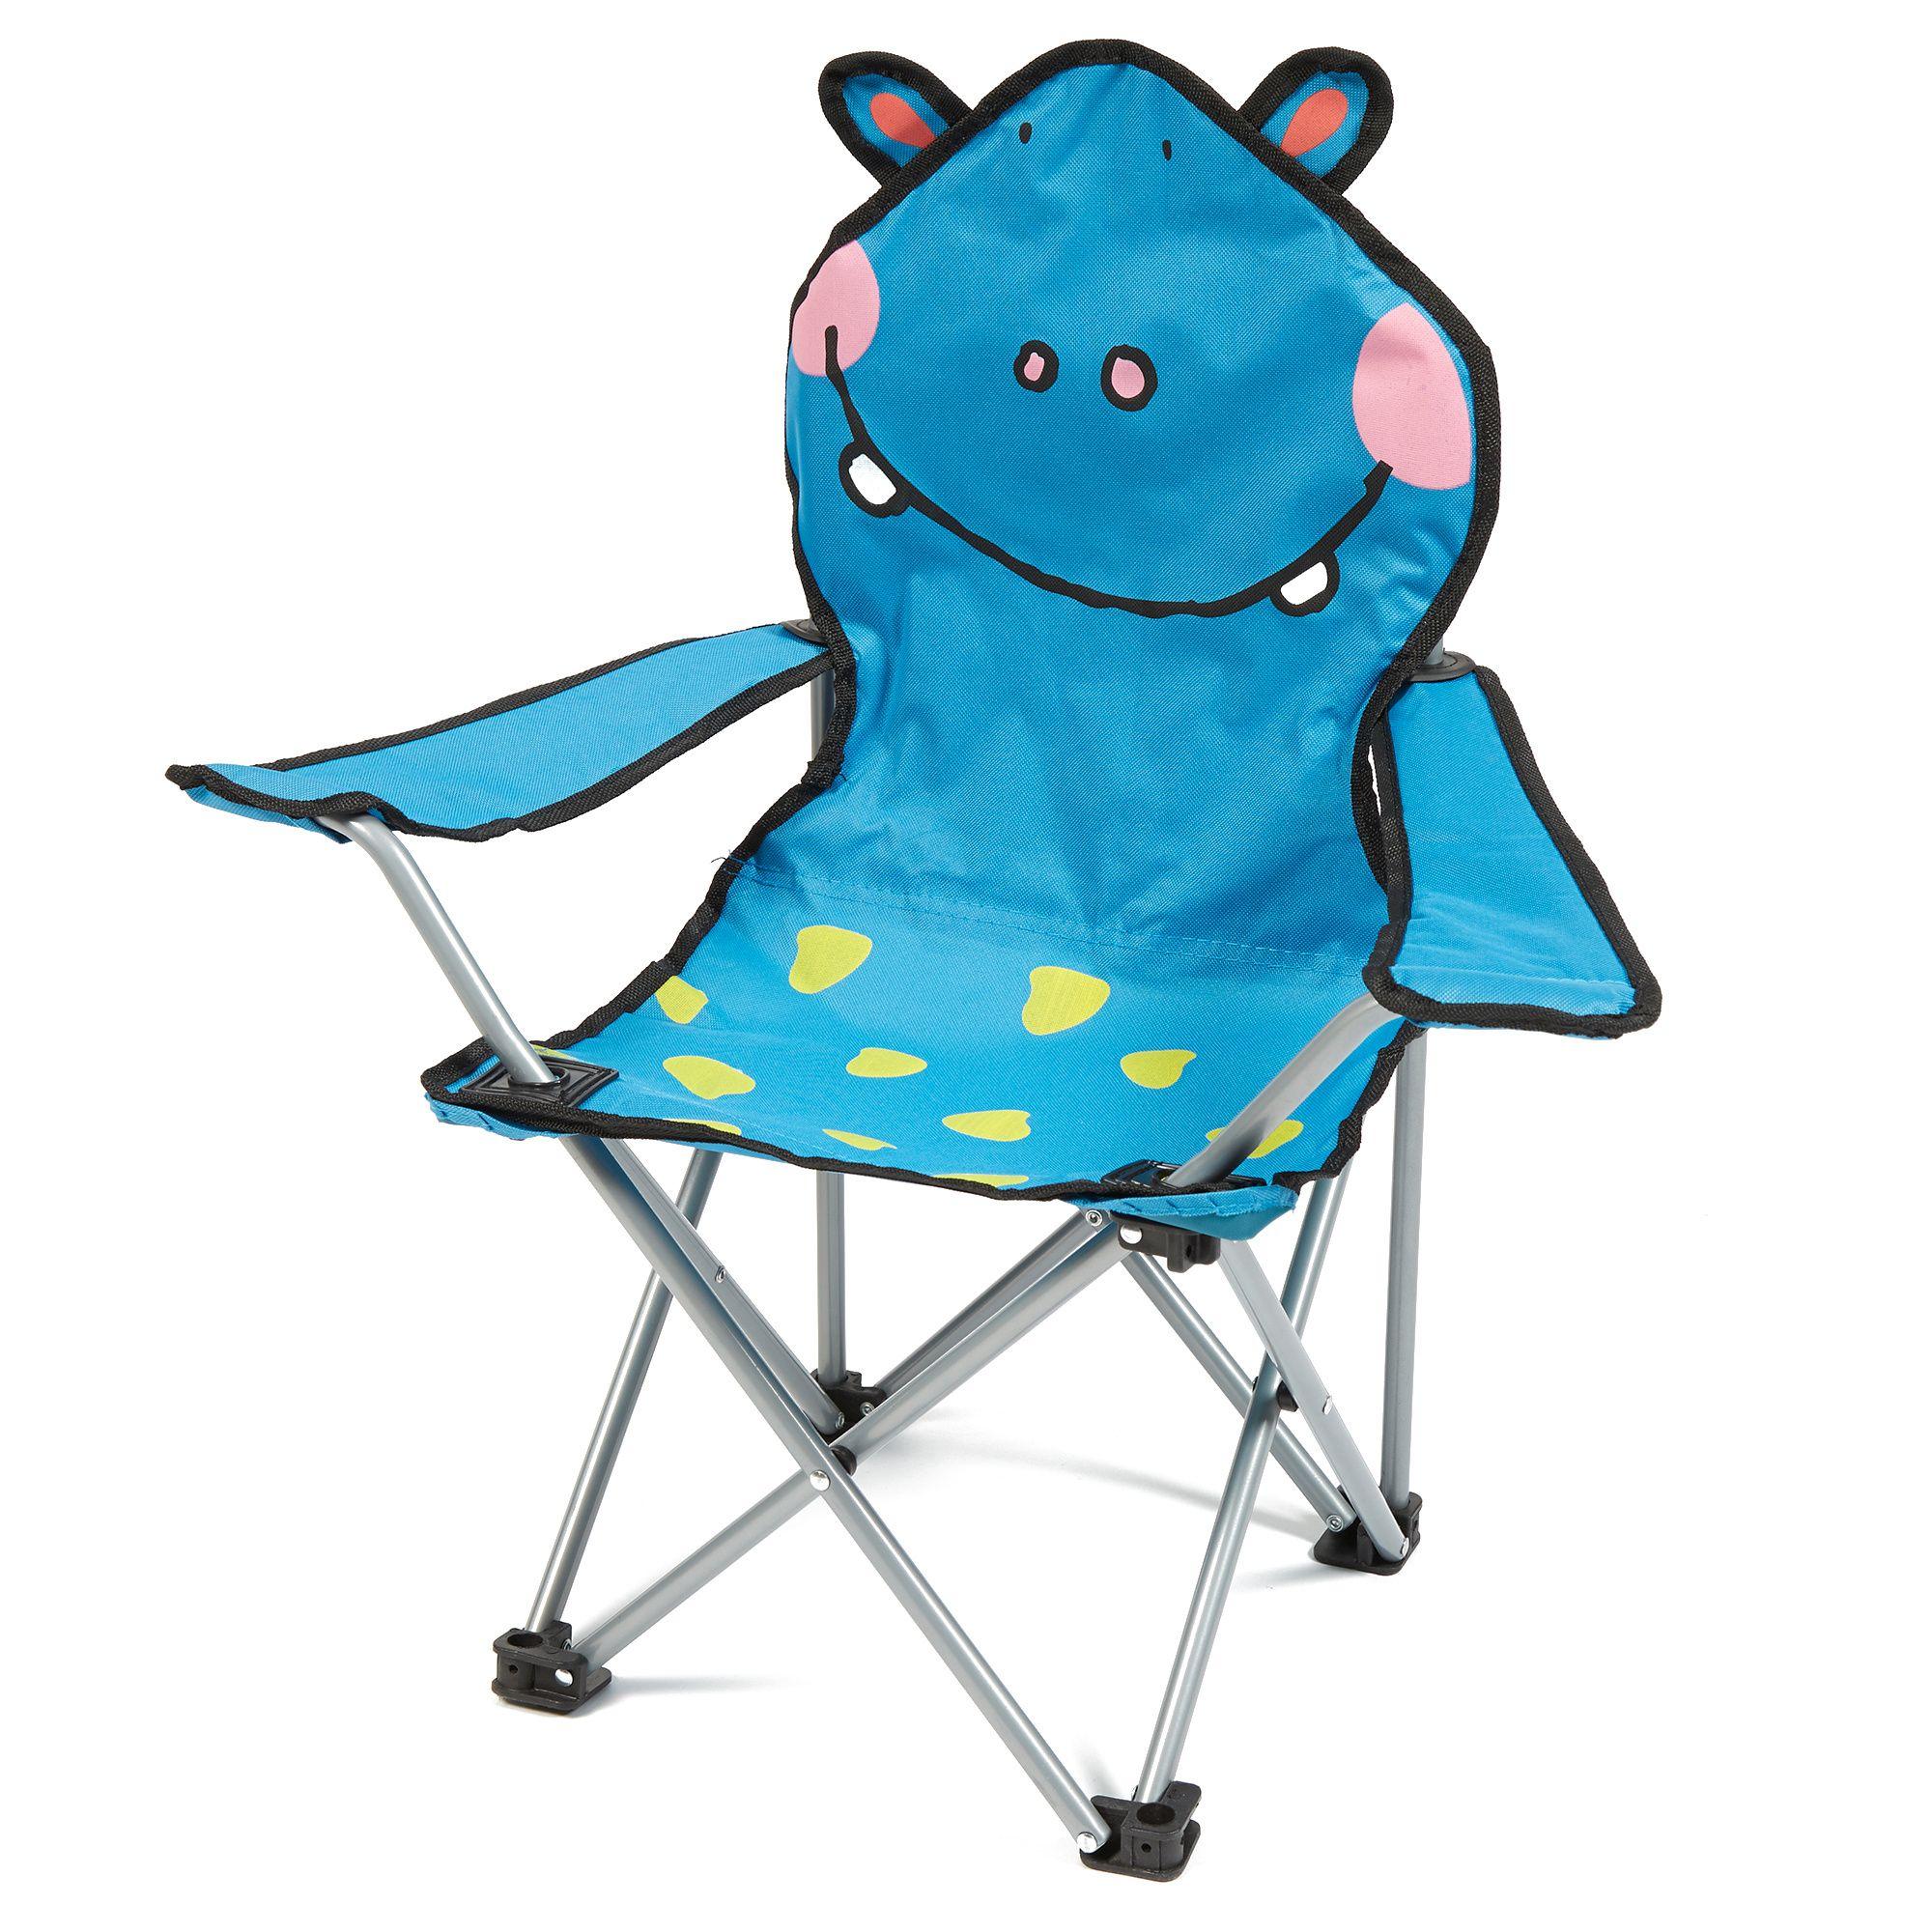 EUROHIKE Kids' Hippo Folding Chair